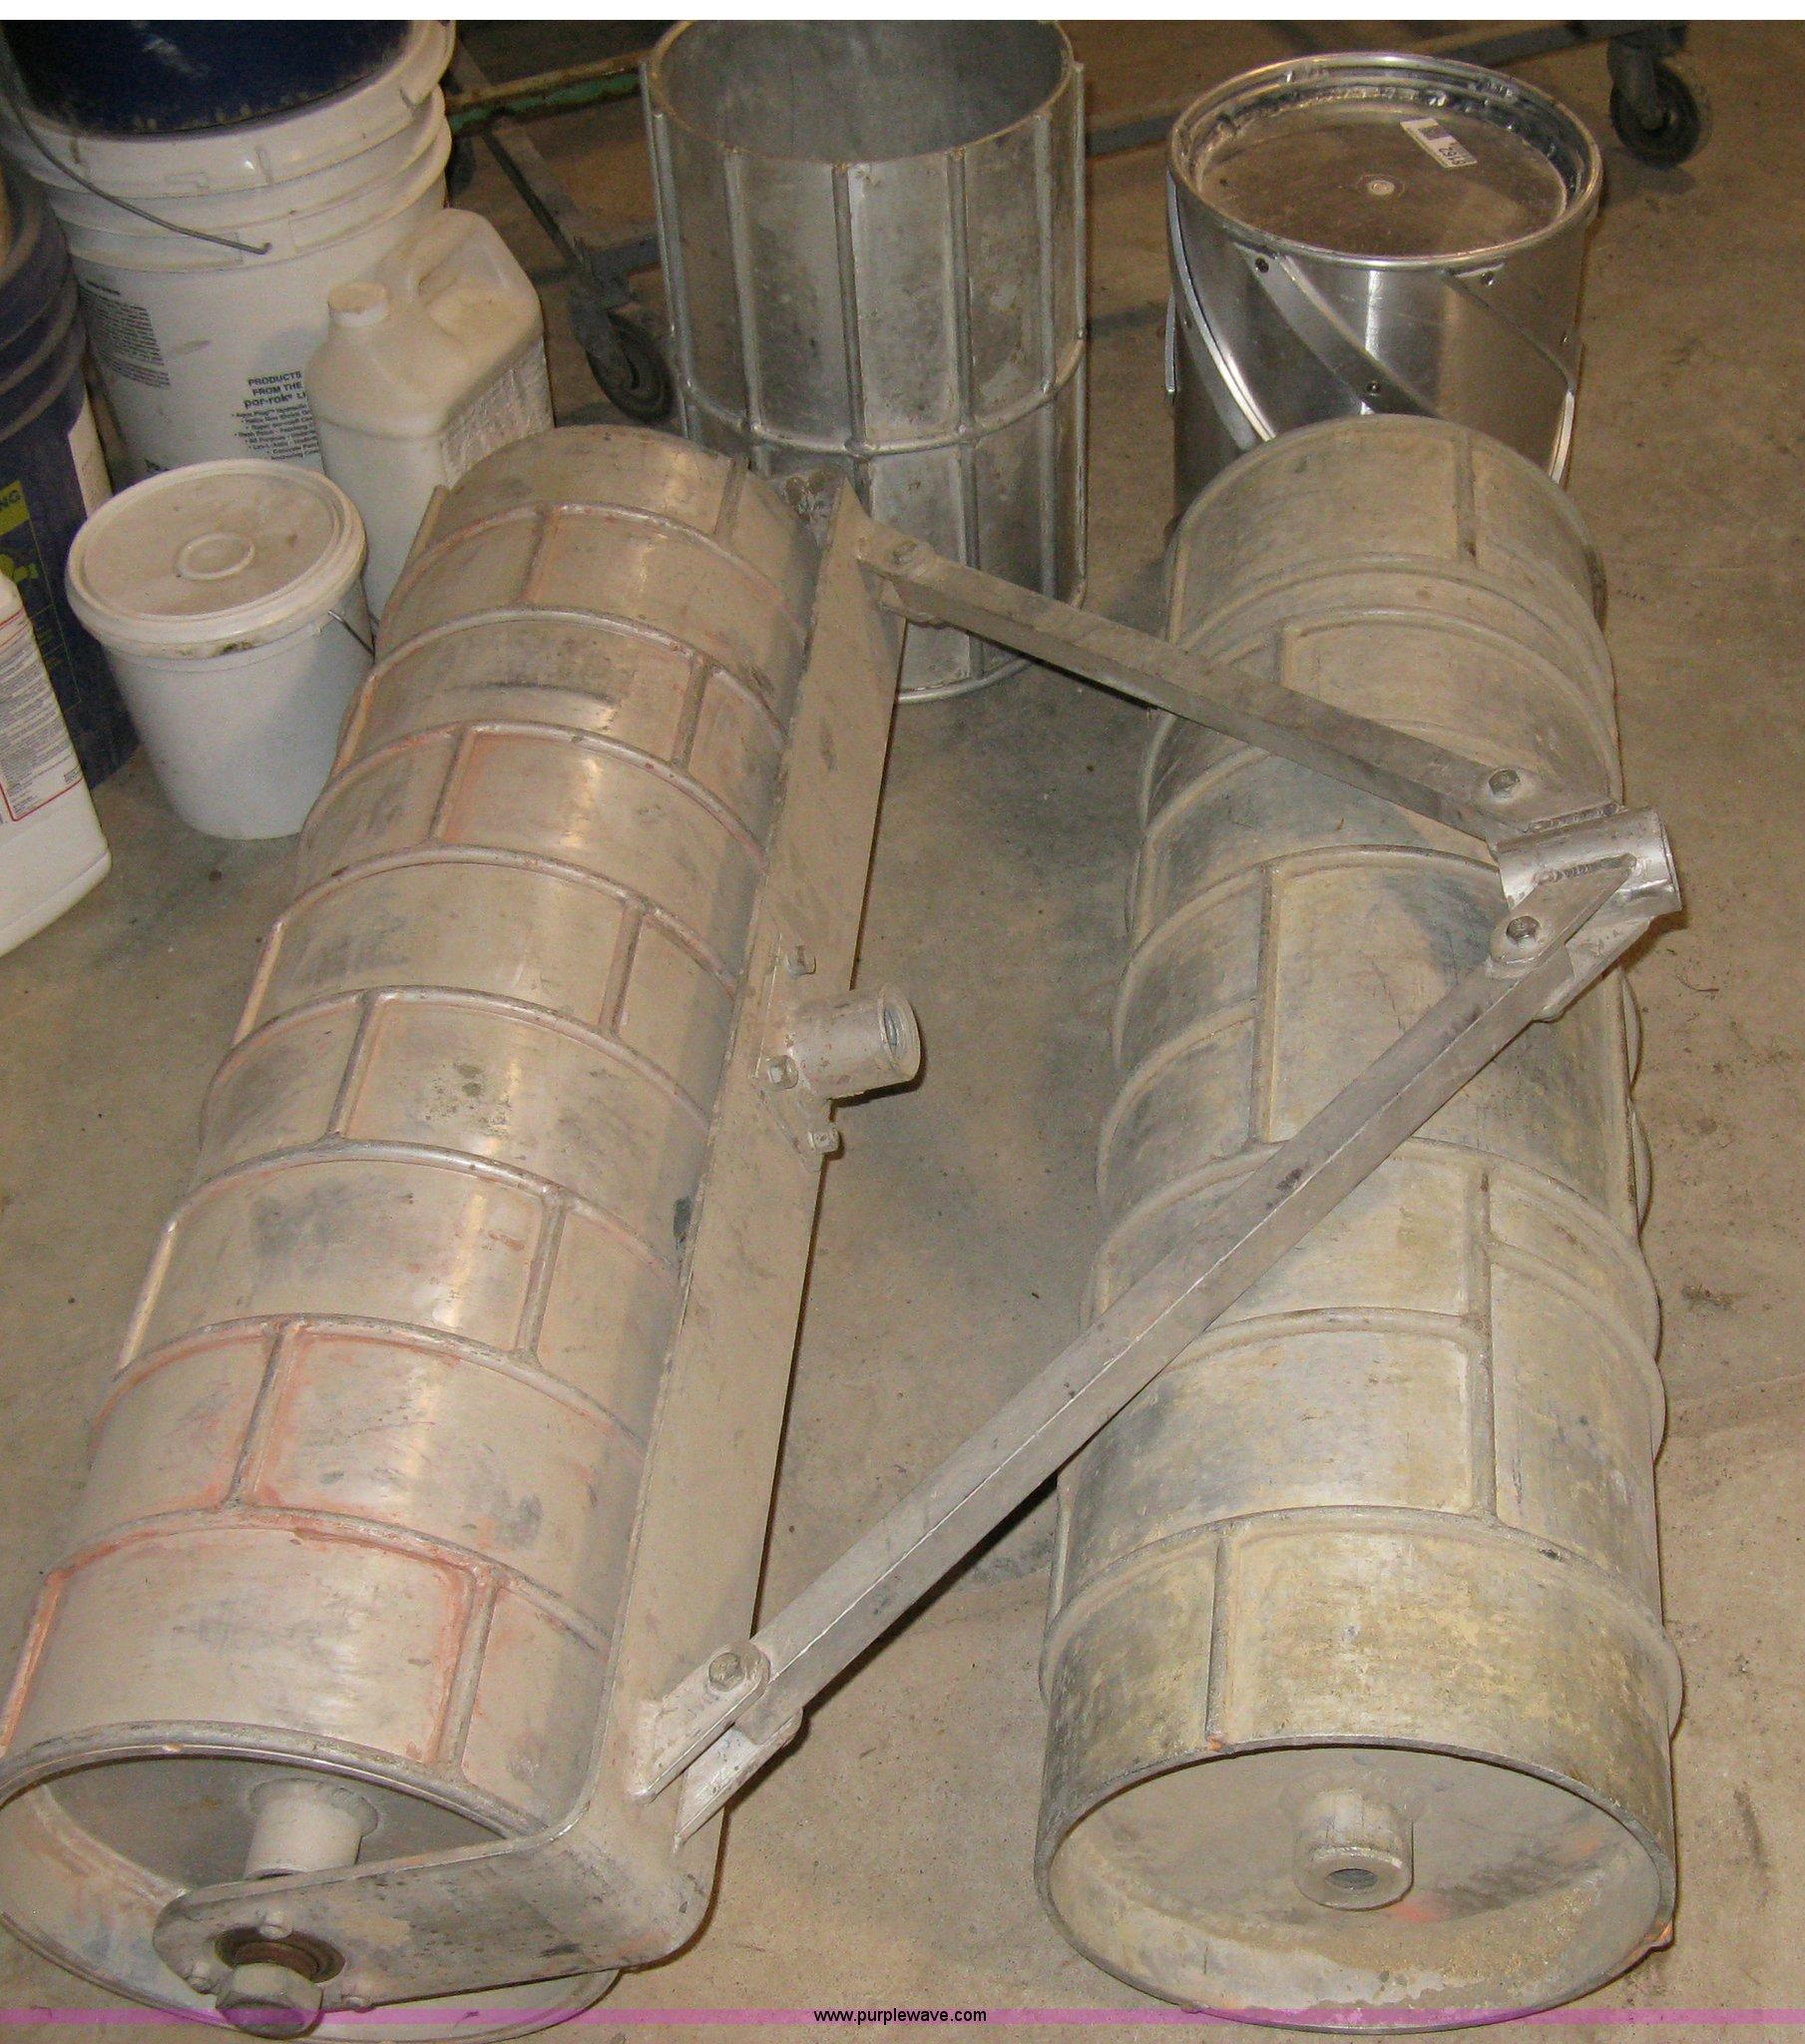 Trucks For Sale Wichita Ks >> Aluminum concrete stamping tool in Wichita, KS | Item 8162 sold | Purple Wave